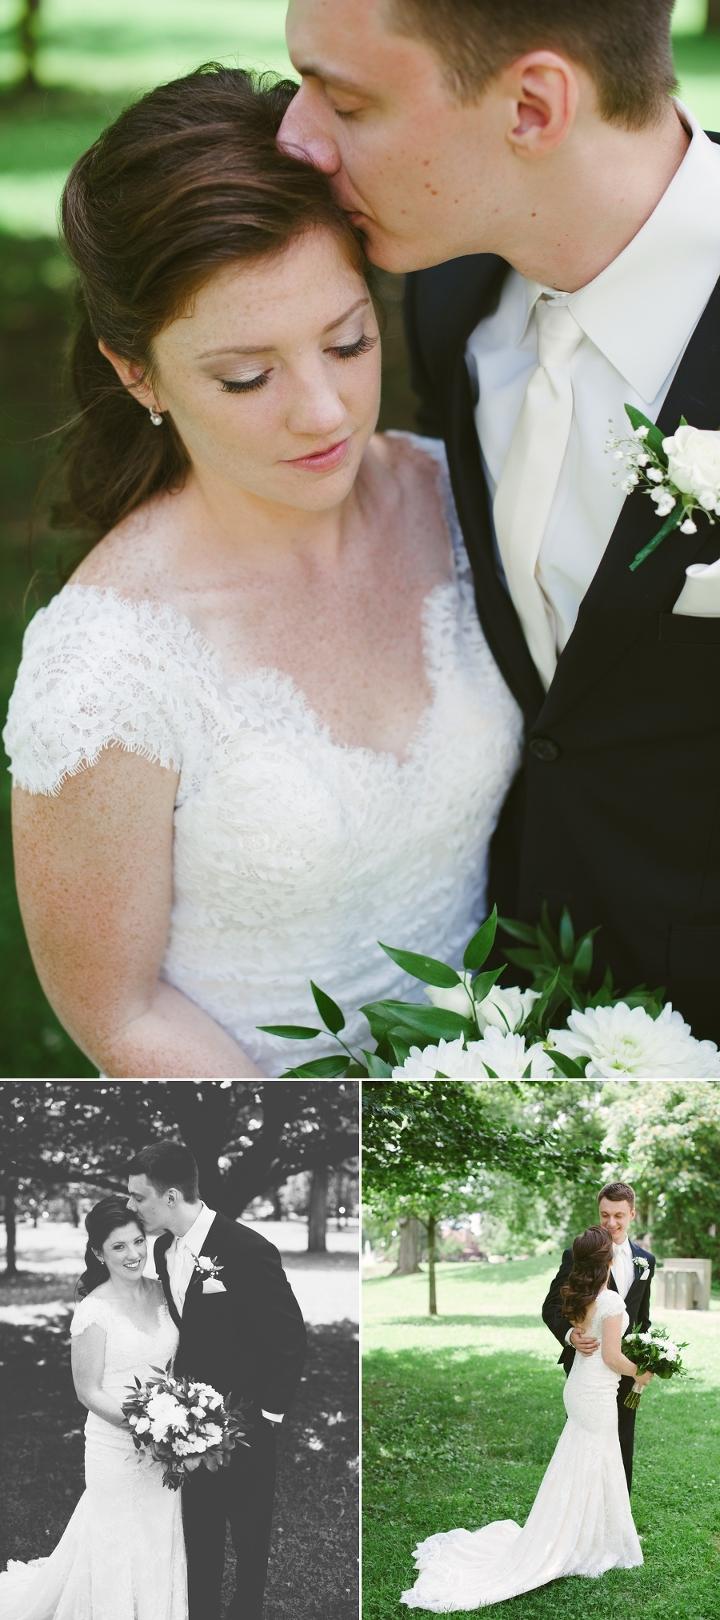 jill and adam married 7